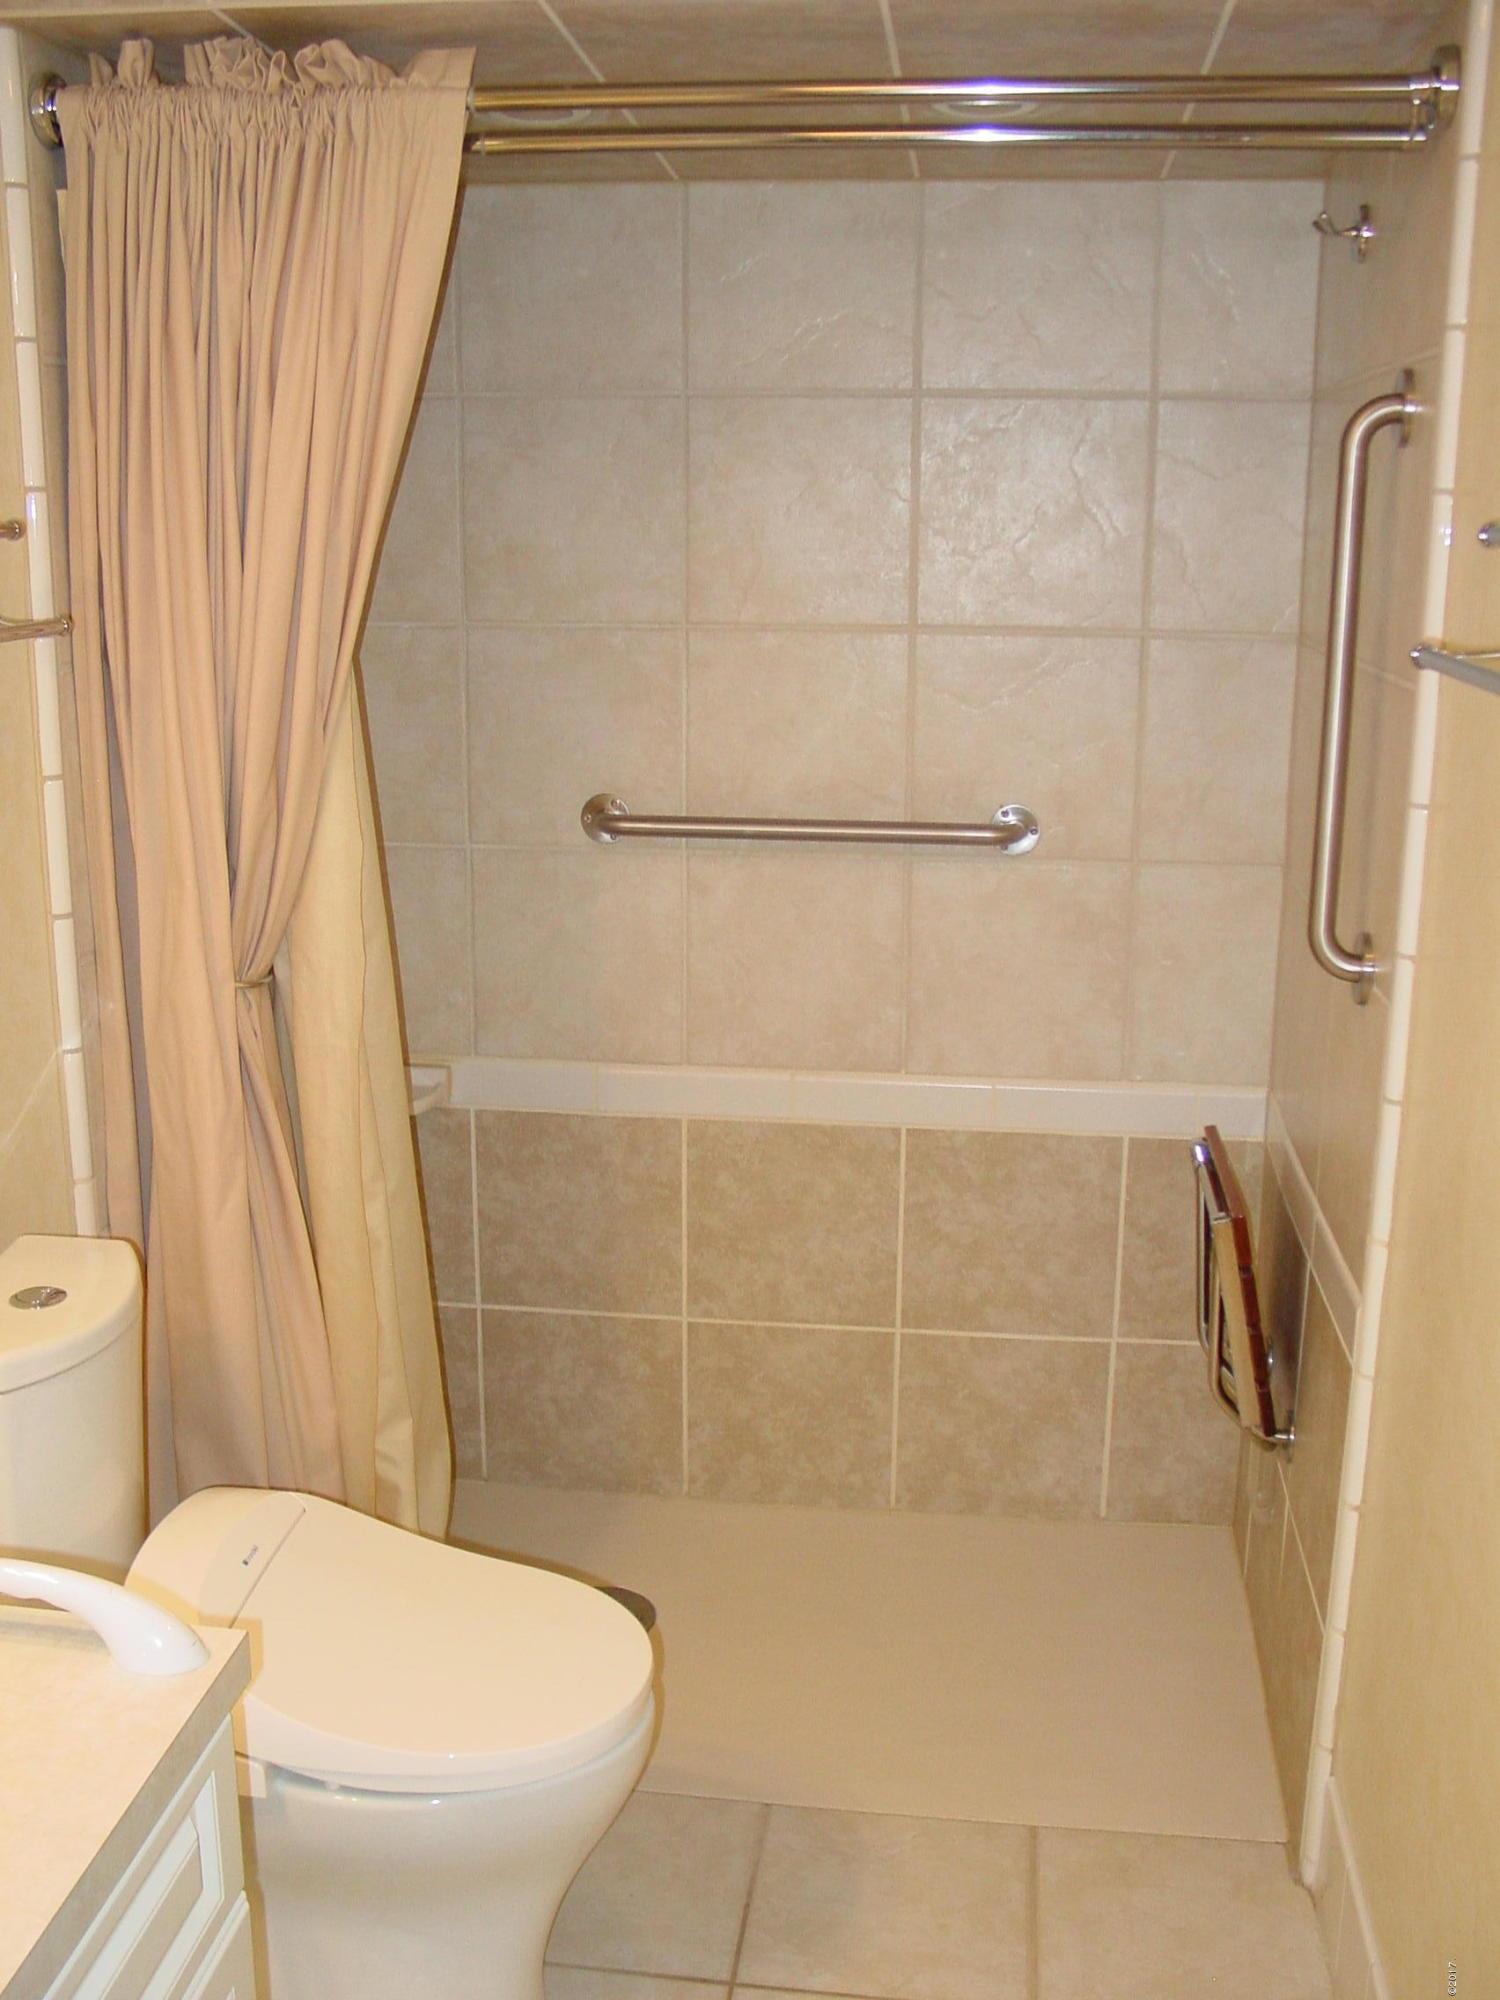 Additional photo for property listing at 5 Brookside Way 5 Brookside Way Missoula, Montana 59802 United States